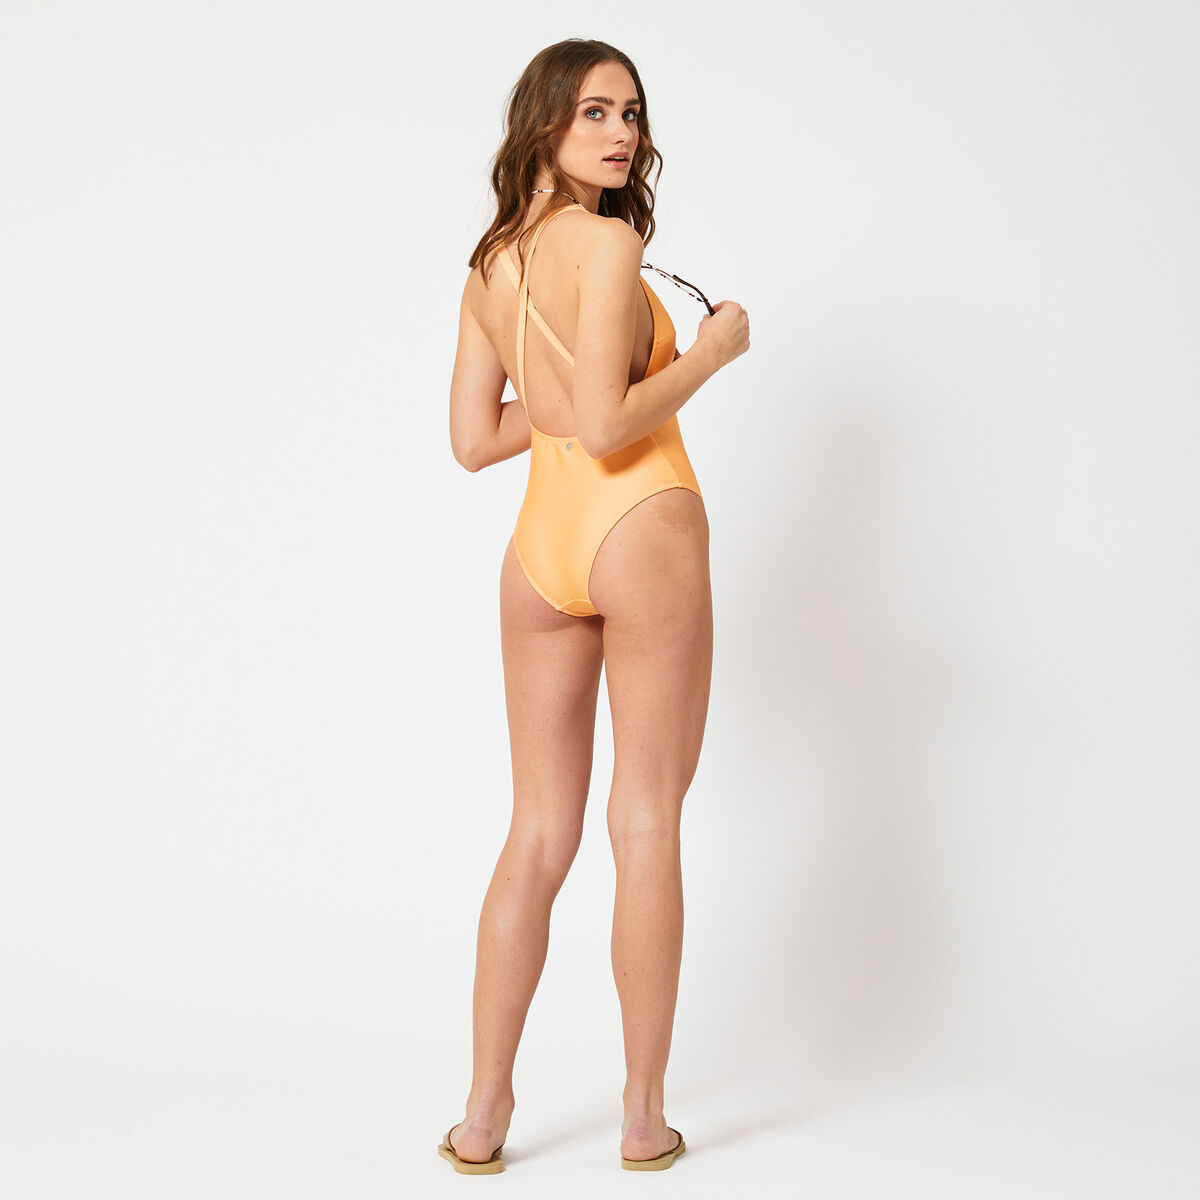 Swimsuit Angel swimsuit